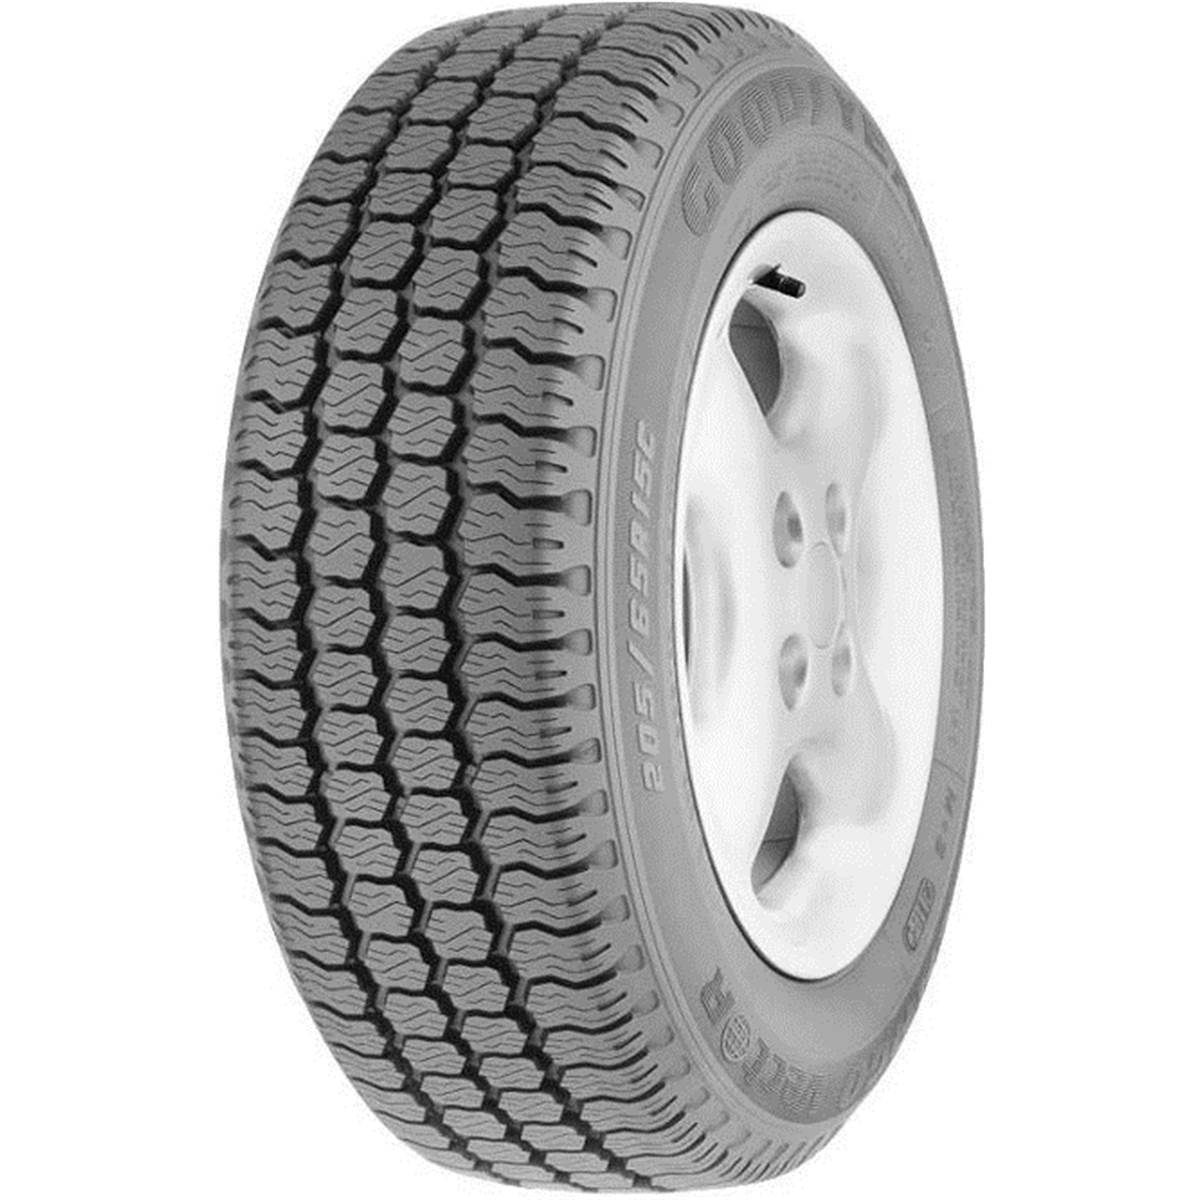 pneu goodyear cargo vector 2 moins cher sur pneu pas cher. Black Bedroom Furniture Sets. Home Design Ideas